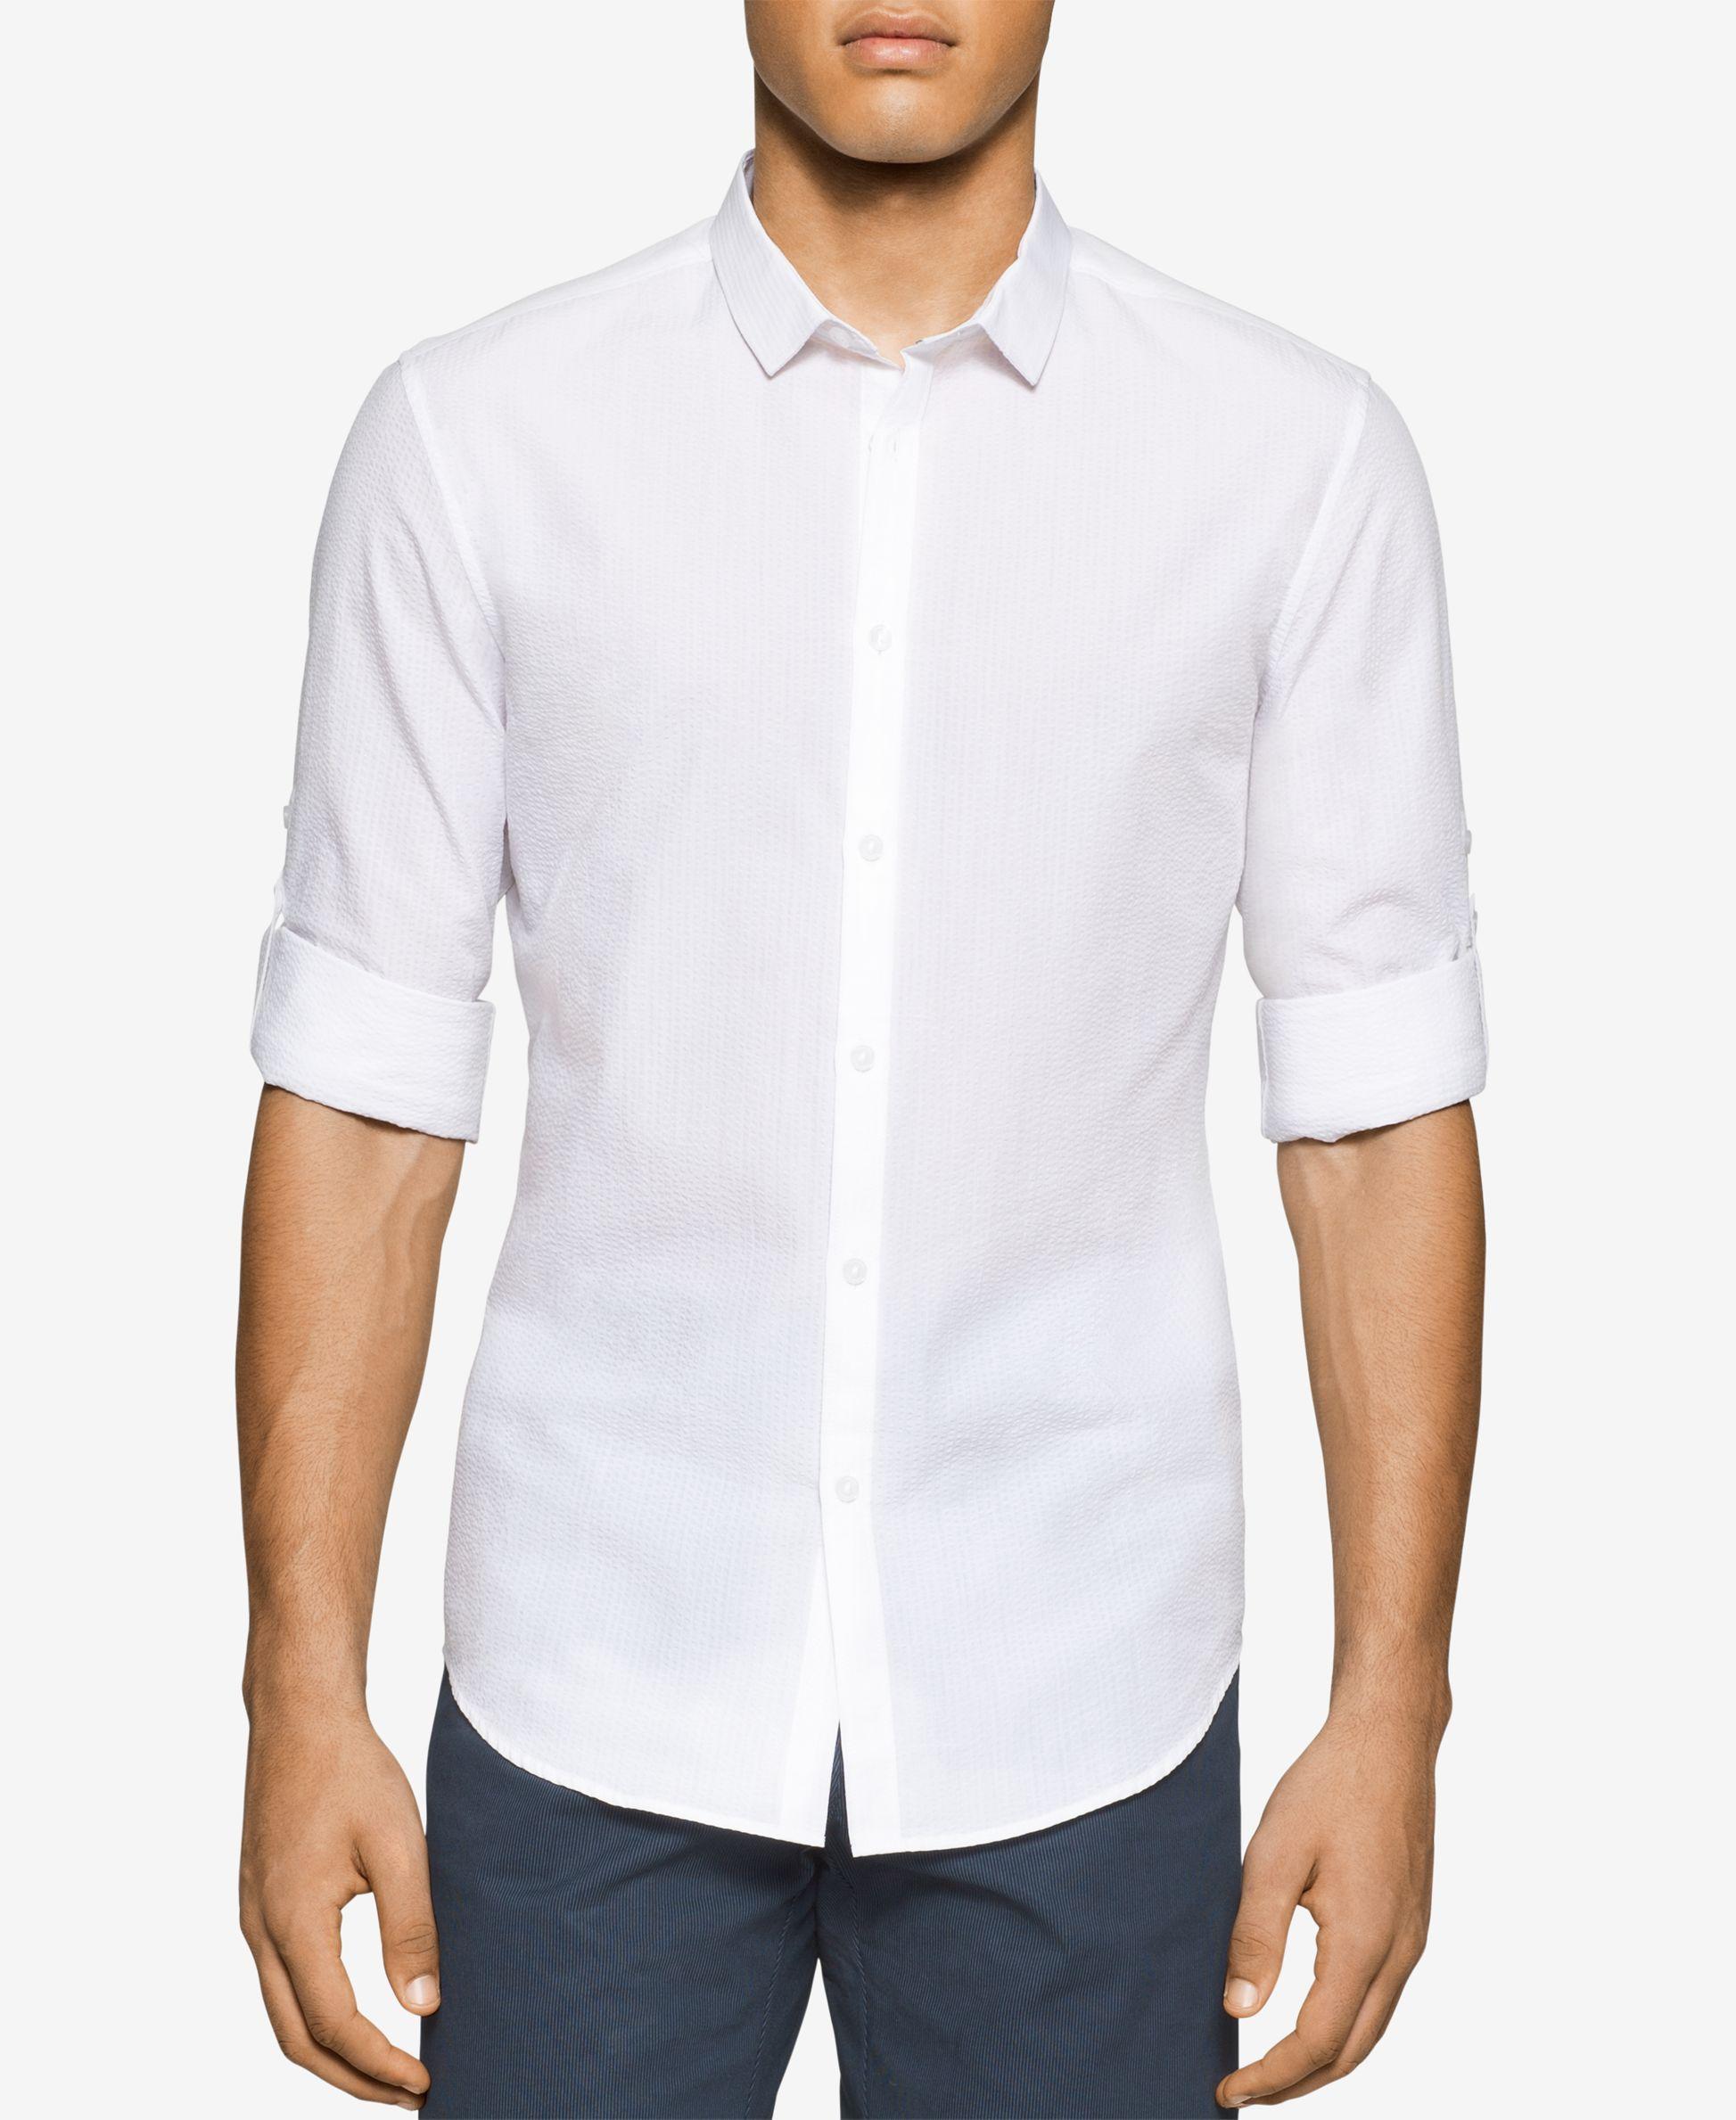 Calvin Klein Slim Fit Dress Shirt Macys Bcd Tofu House